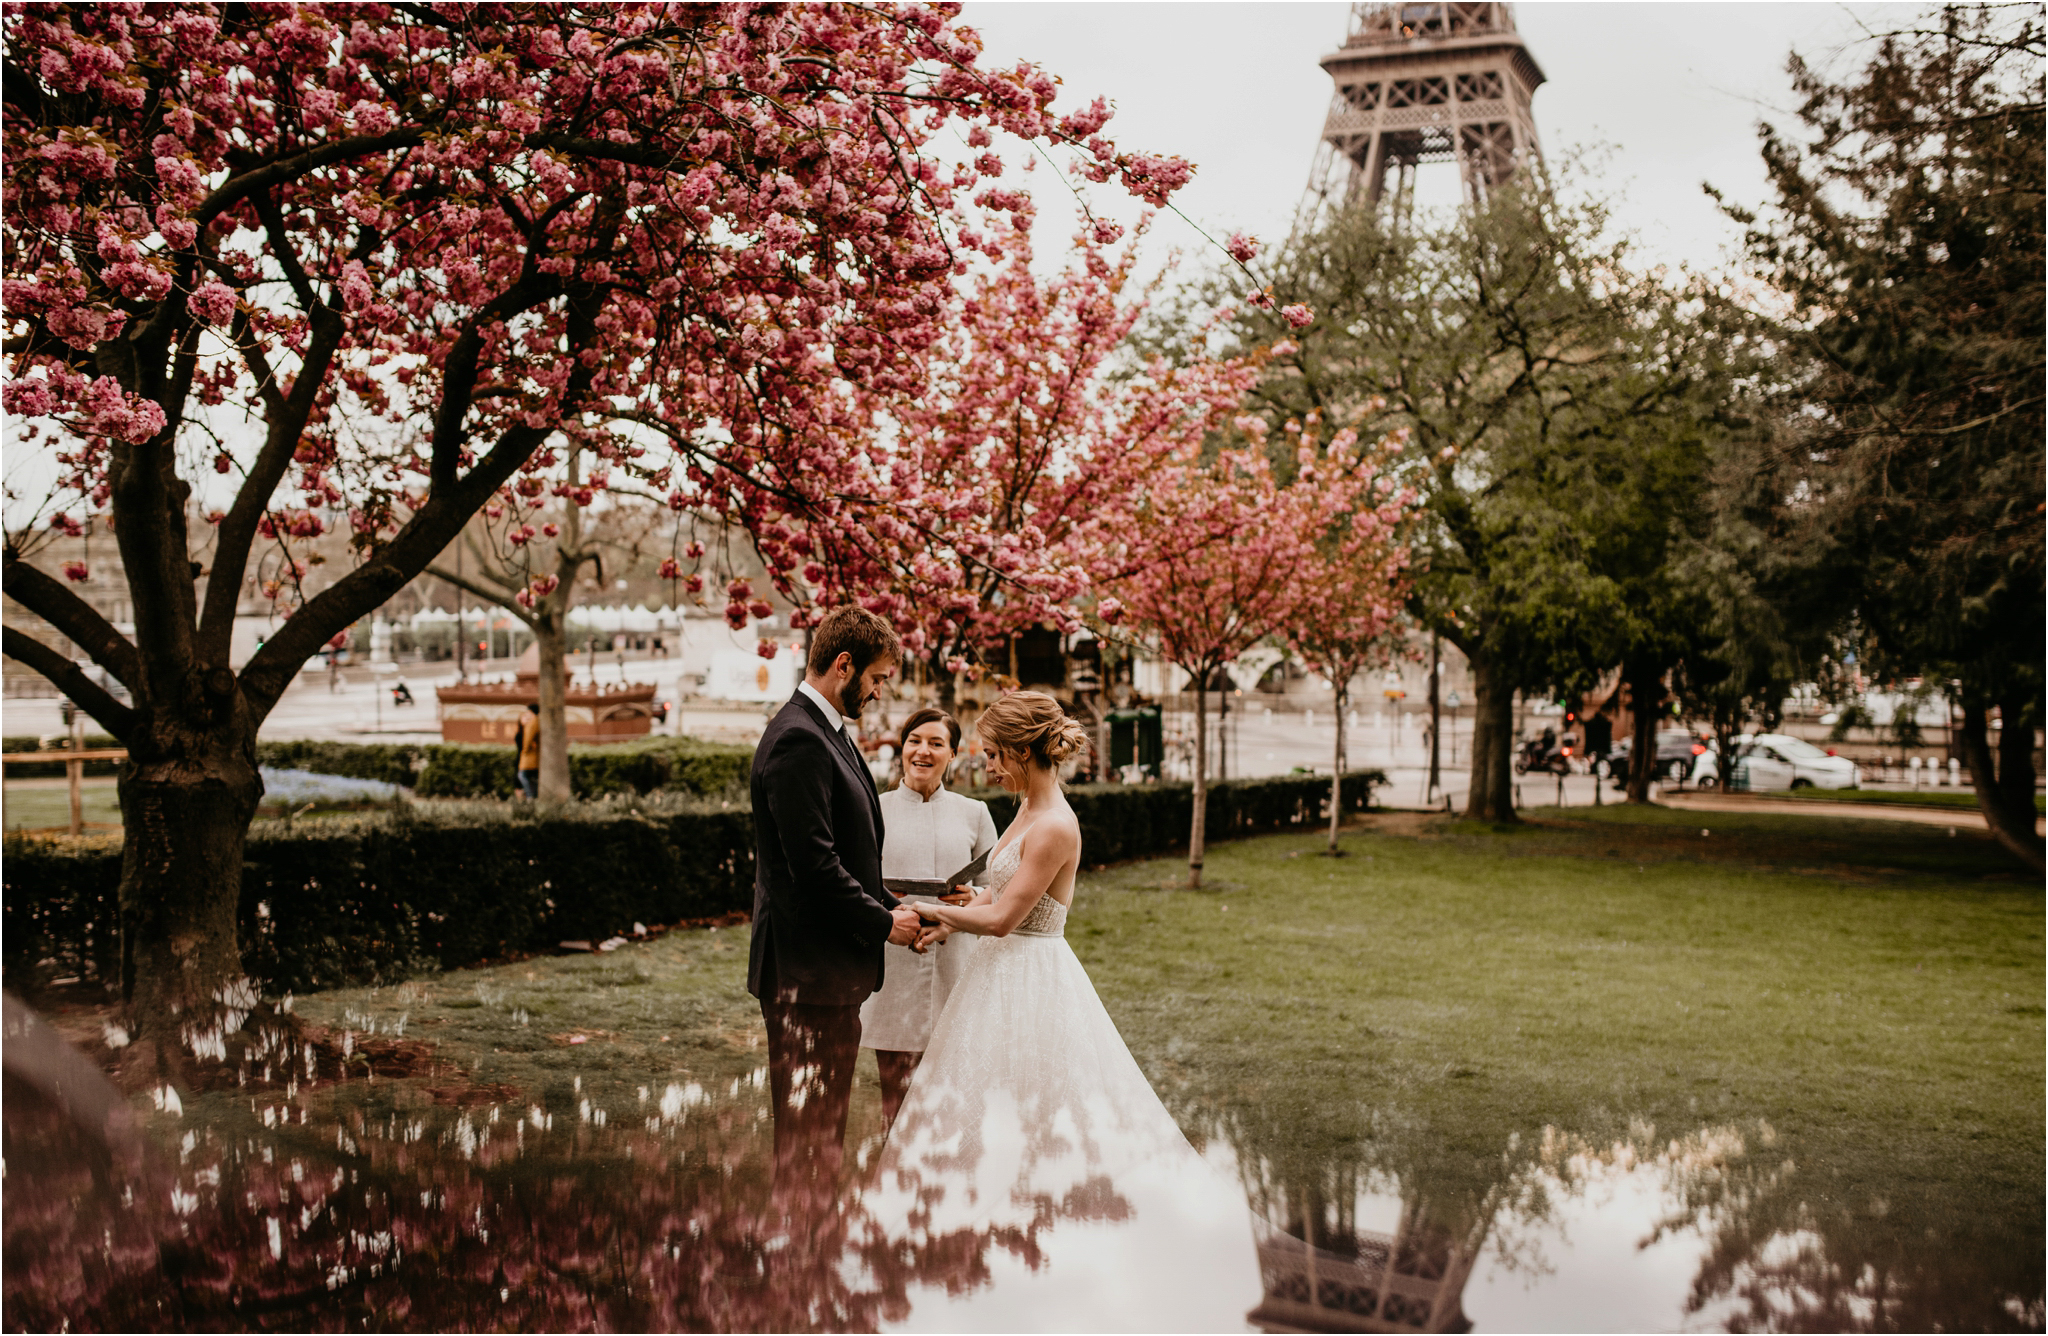 miranda-and-jared-paris-elopement-destination-wedding-photographer-028.jpg